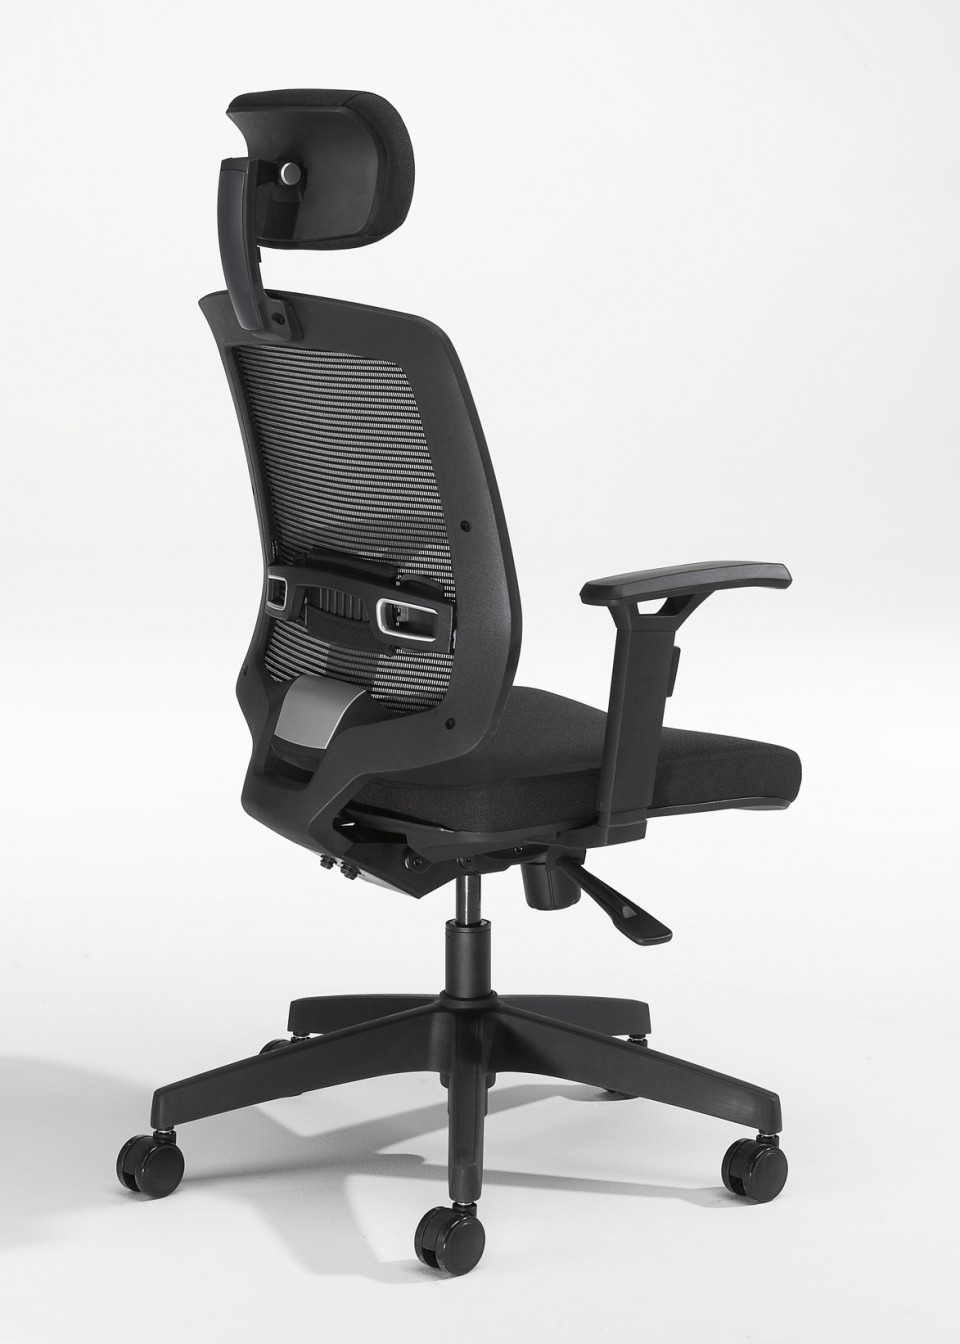 fauteuil de bureau ergonomique major. Black Bedroom Furniture Sets. Home Design Ideas